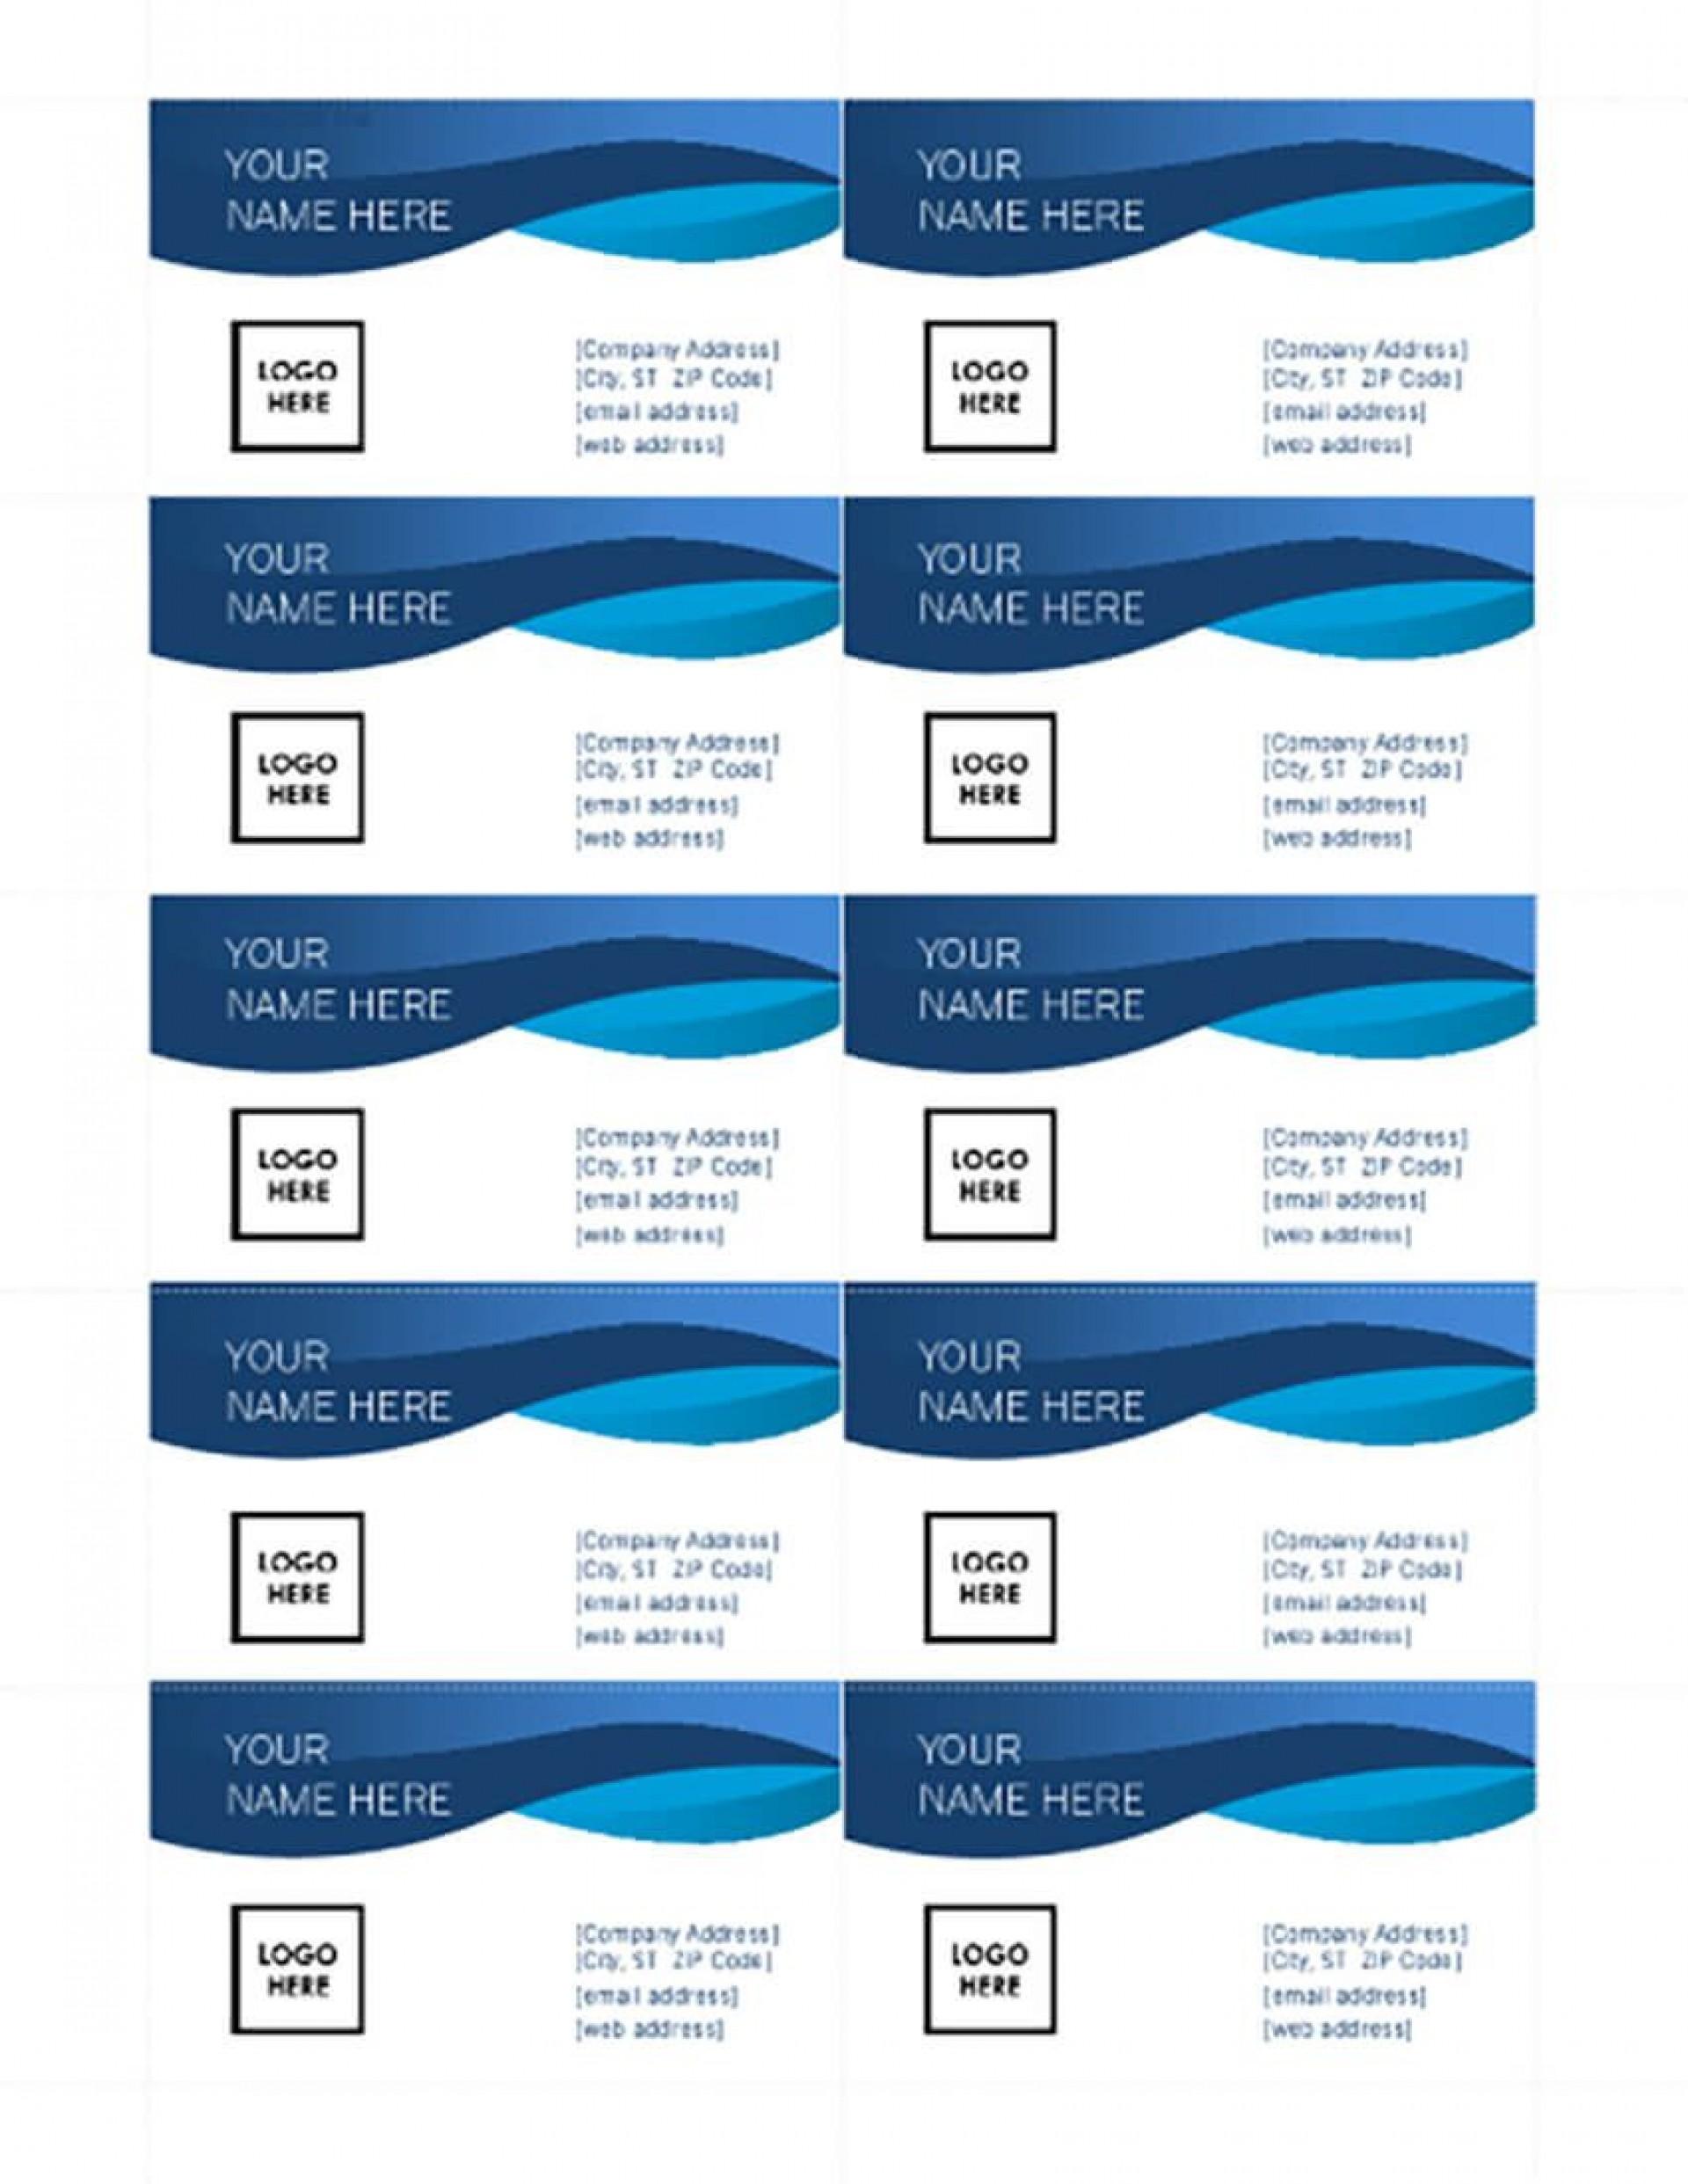 008 Singular Busines Card Template Microsoft Word 2010 Photo 1920